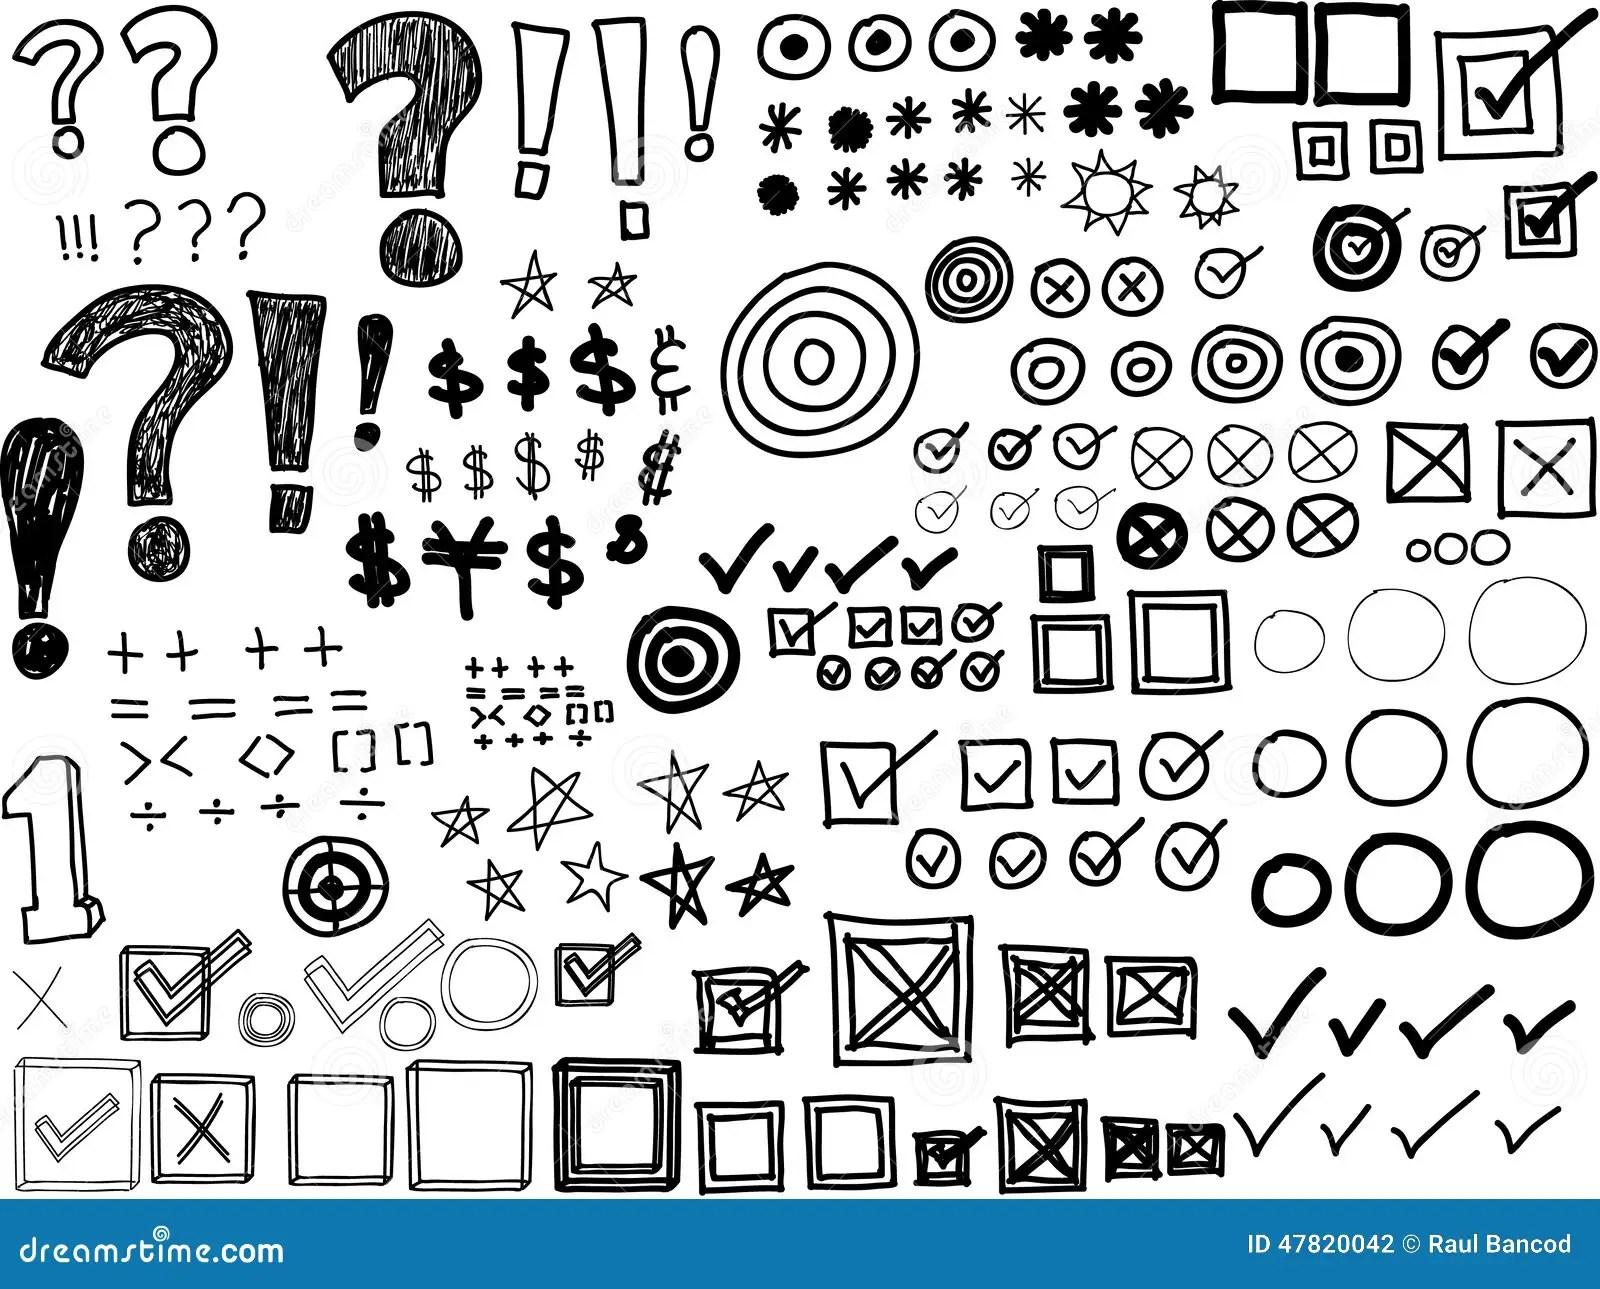 Hand Drawn Doodles Asterisks Bullets Check Marks